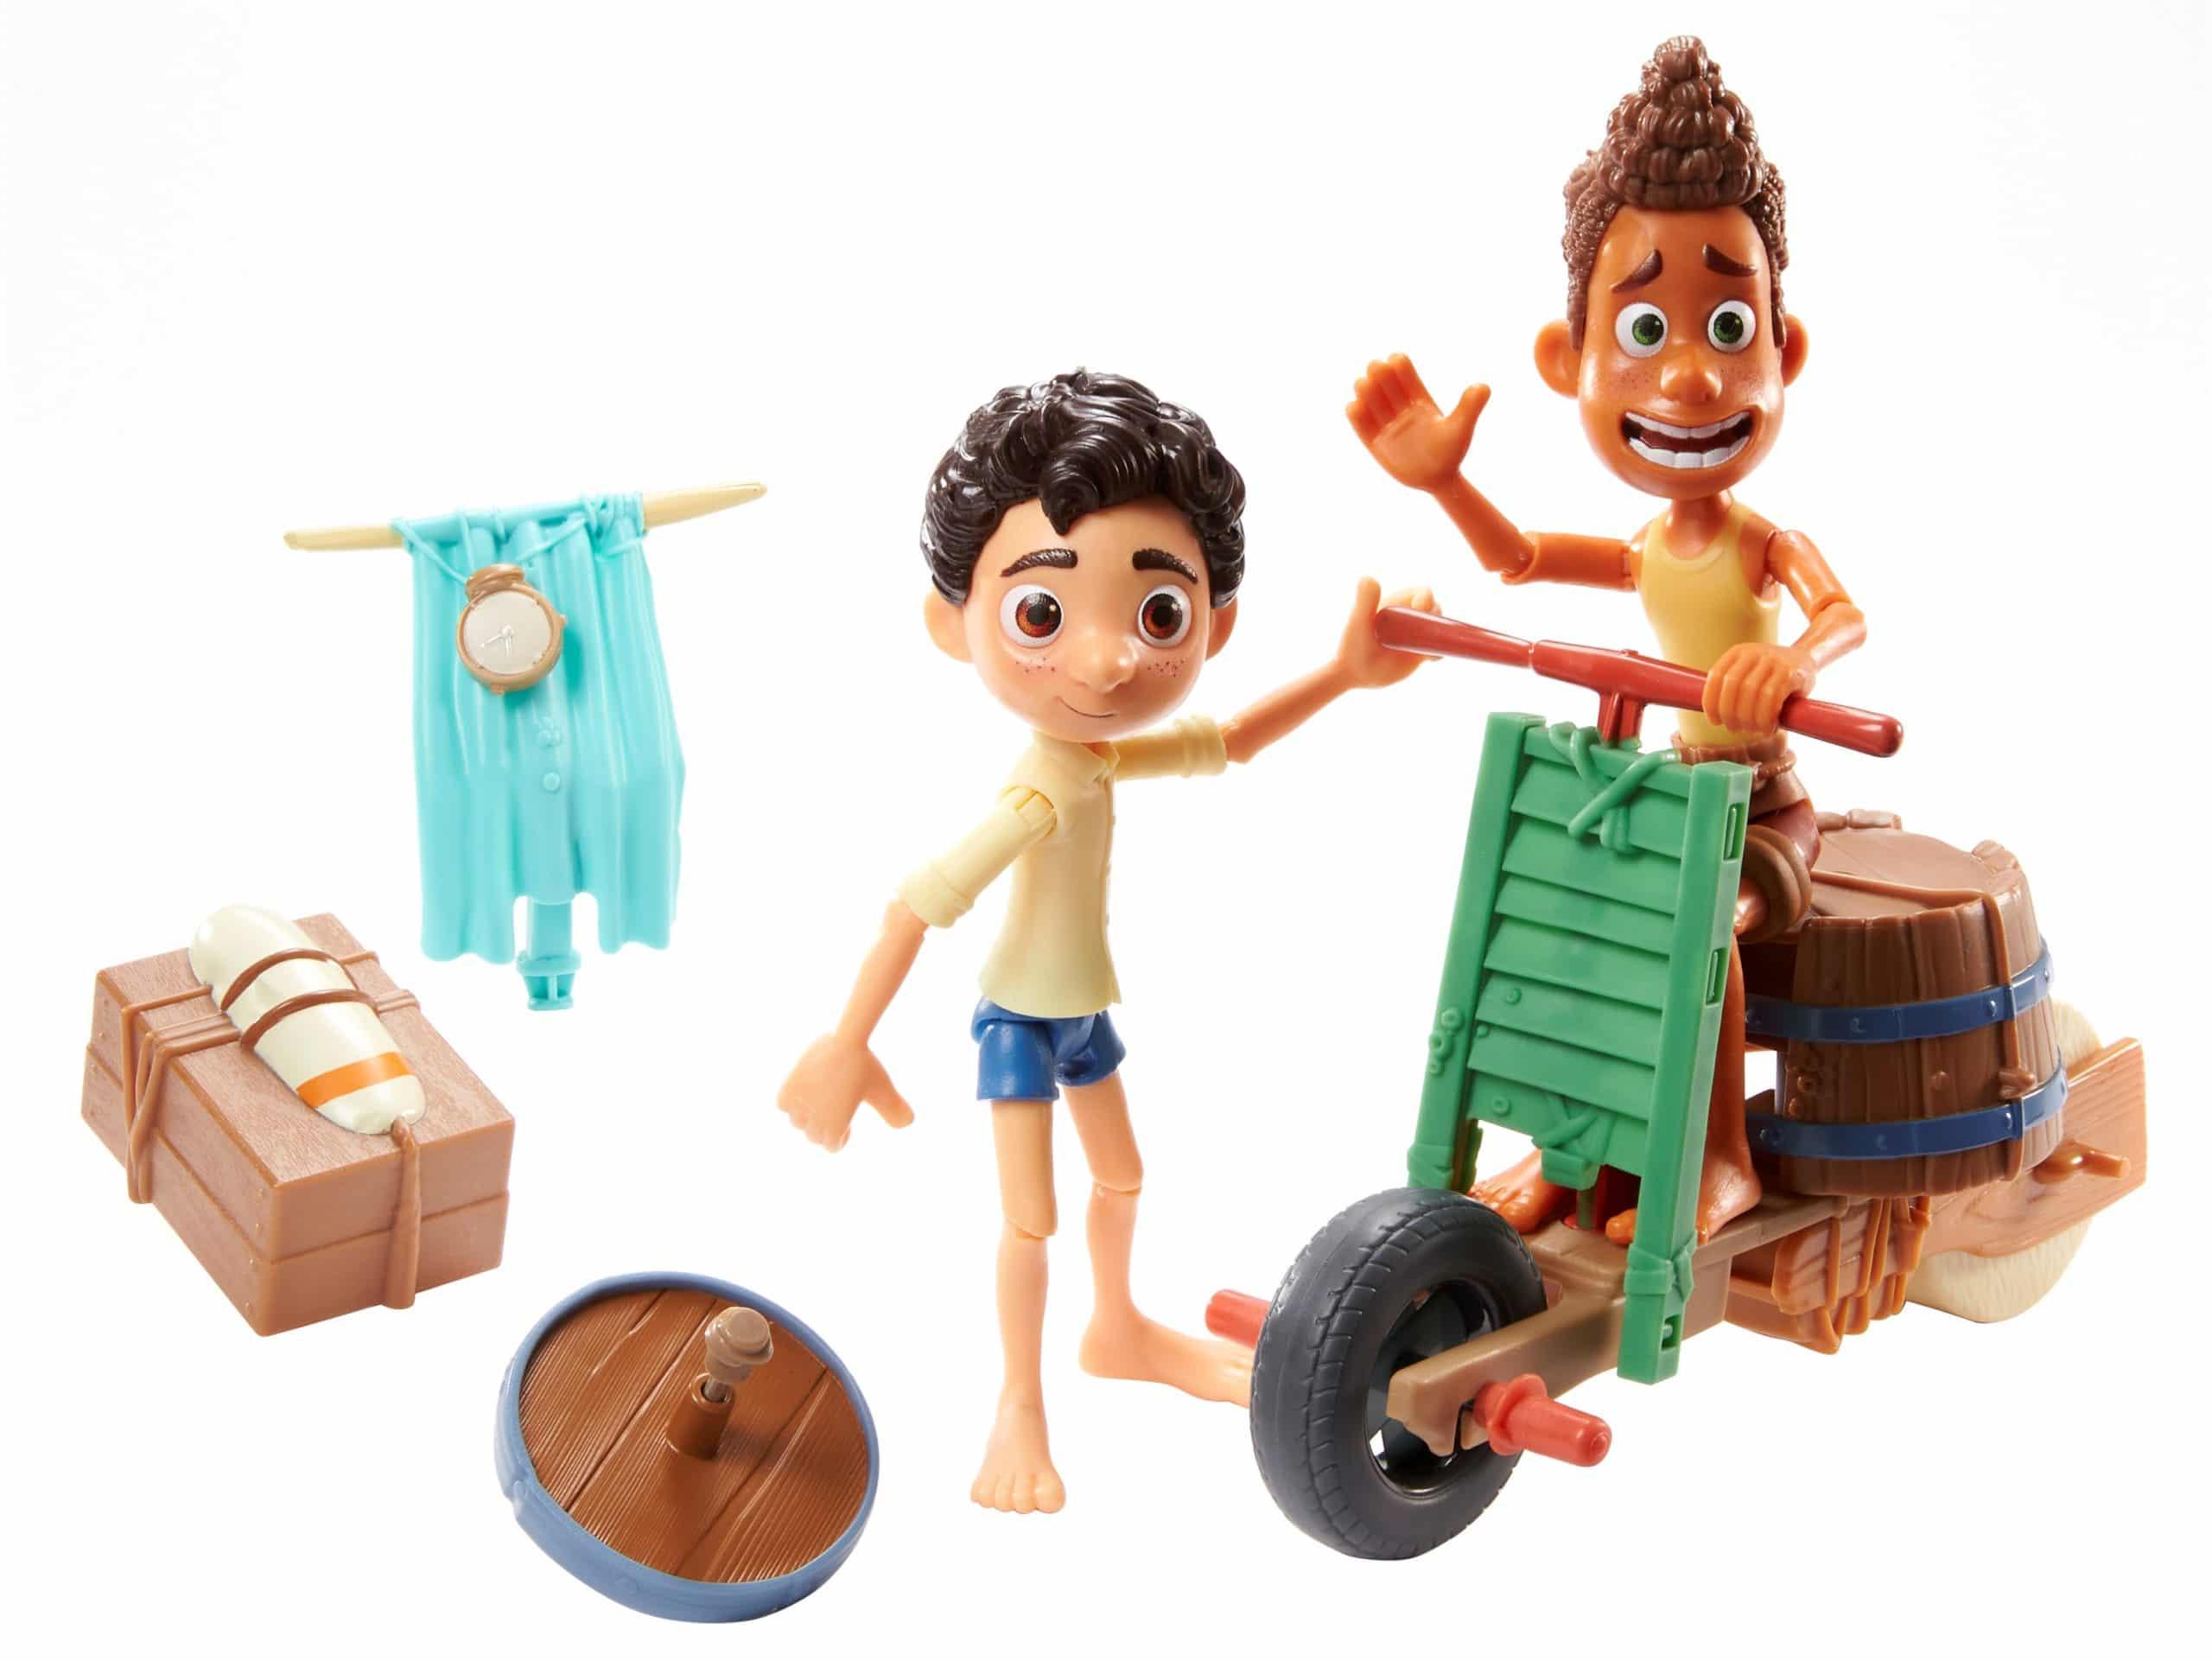 Mattel unveils Luca action figures ahead of the film's Disney+ premiere 17